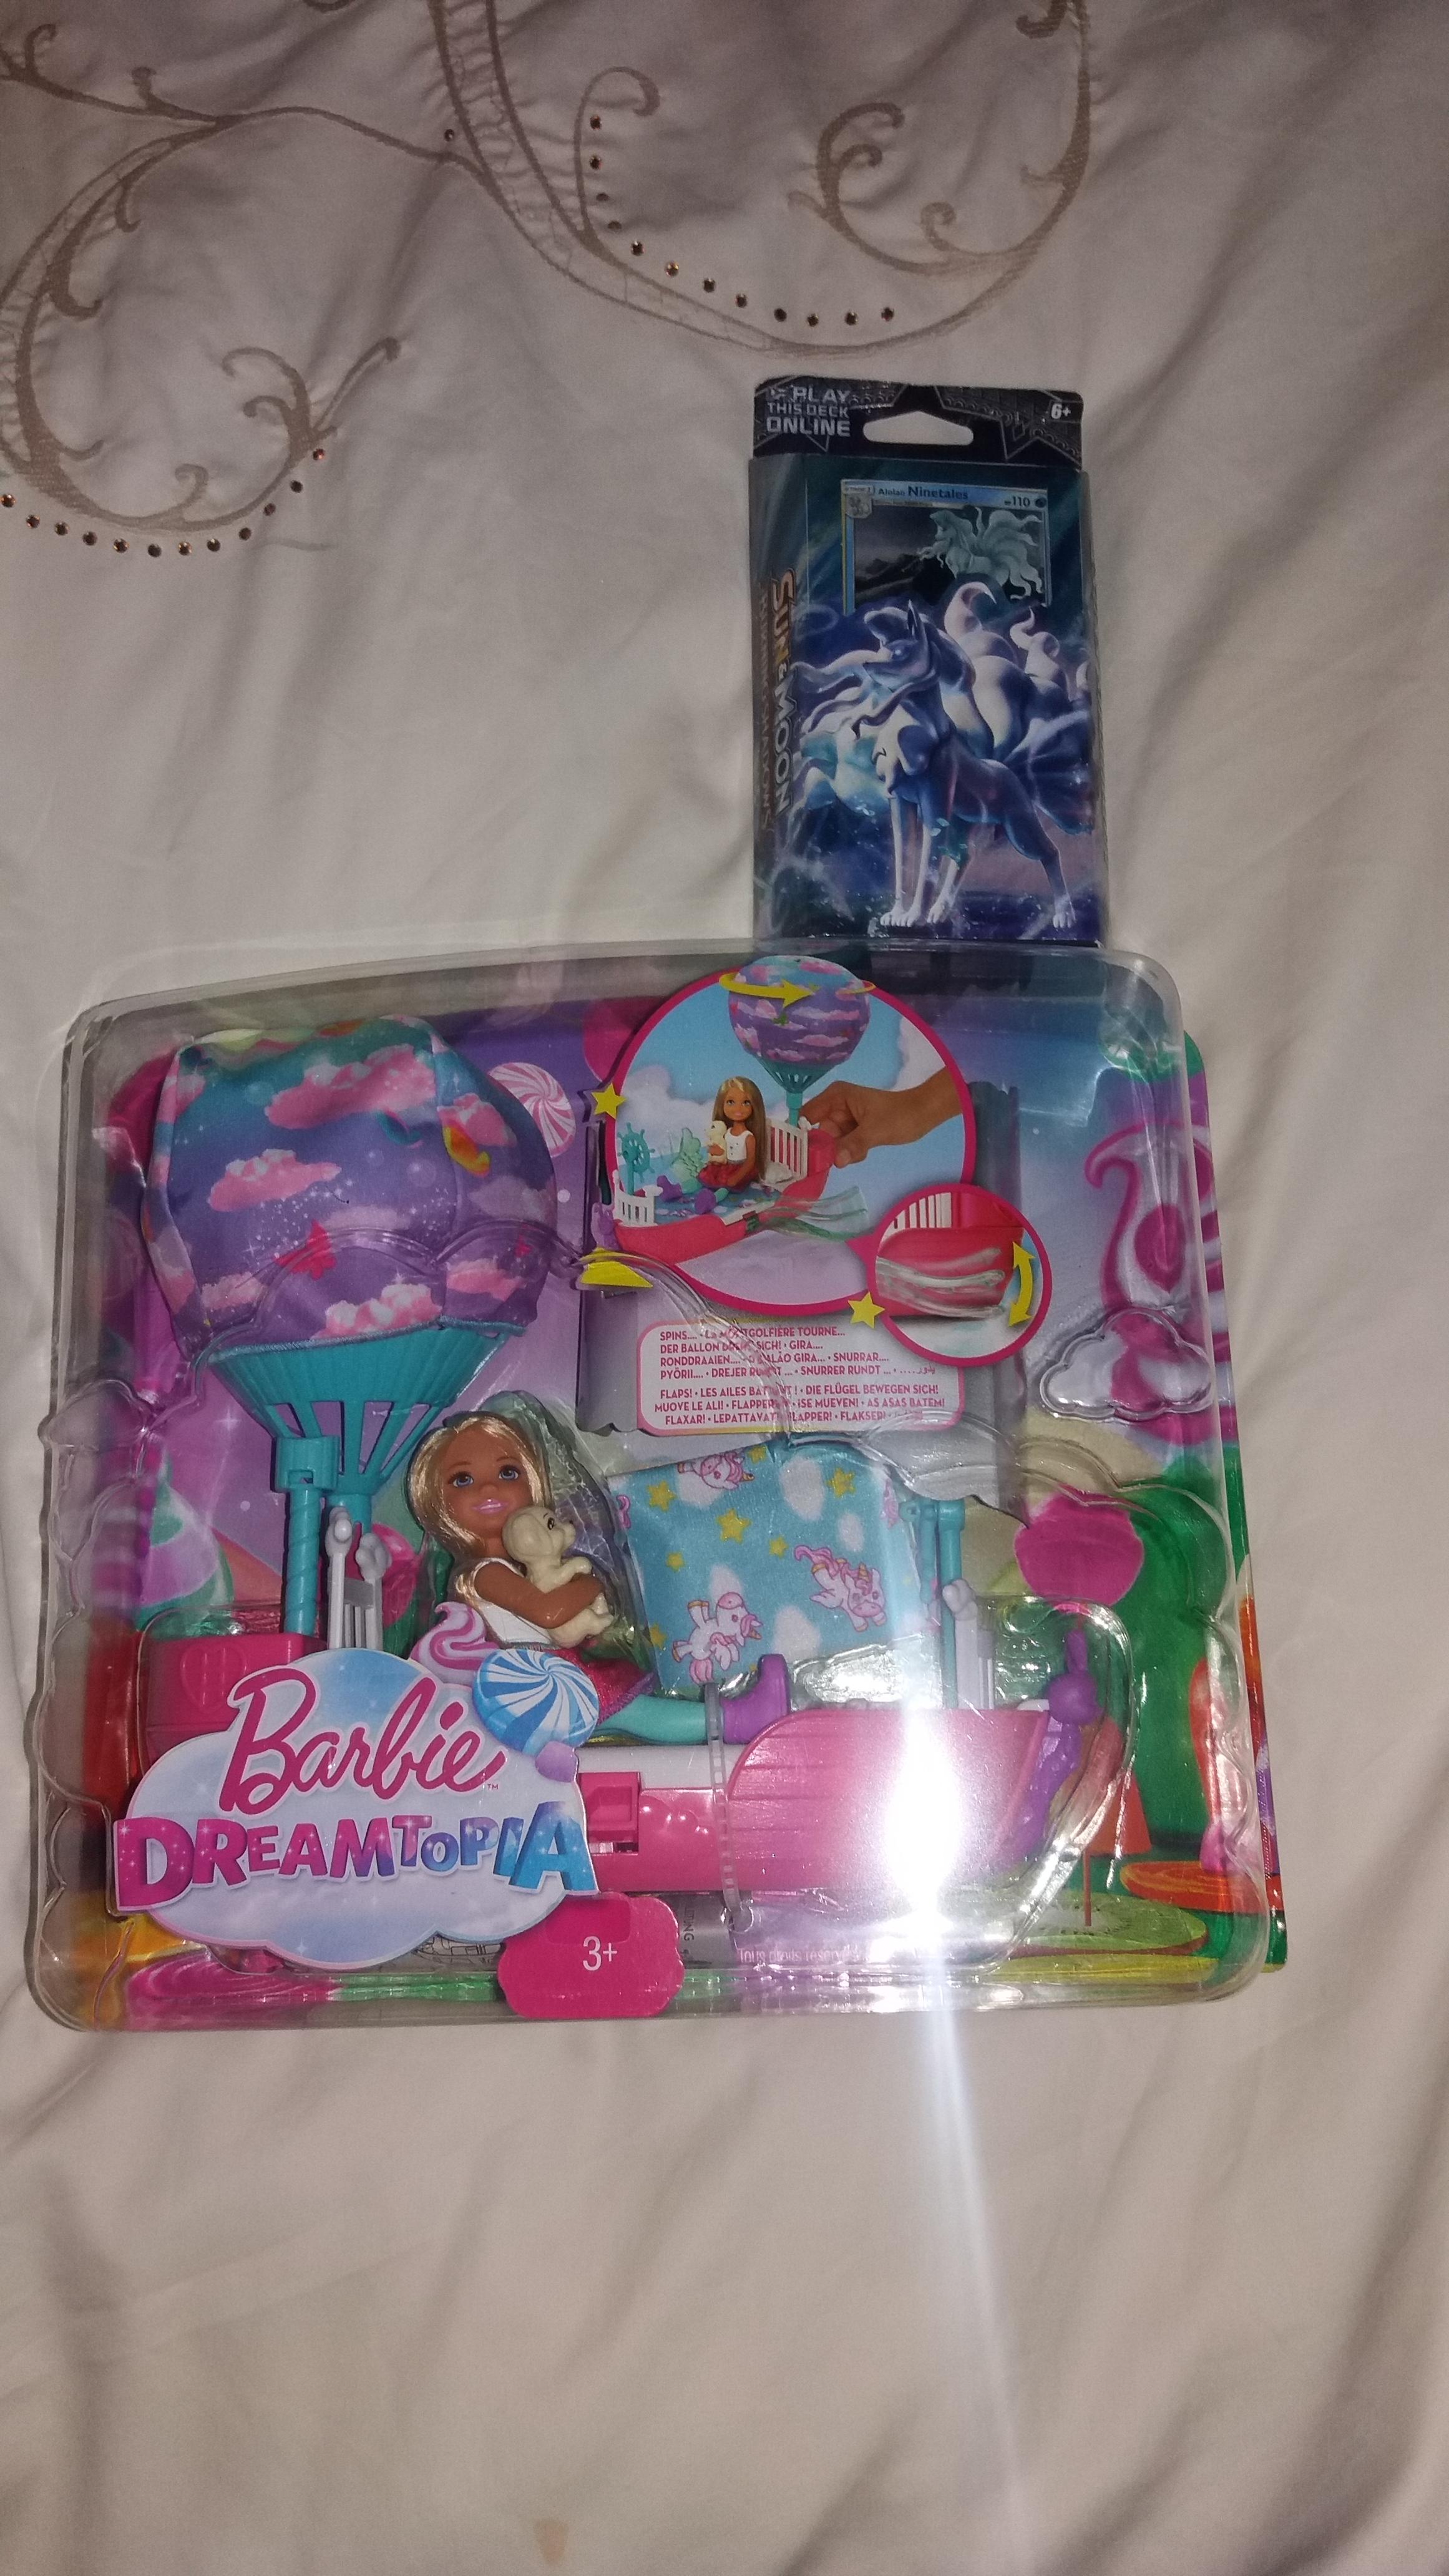 Reduced toys instore e.g Barbie Dreamtopia was down to £6 @ asda (Boston)